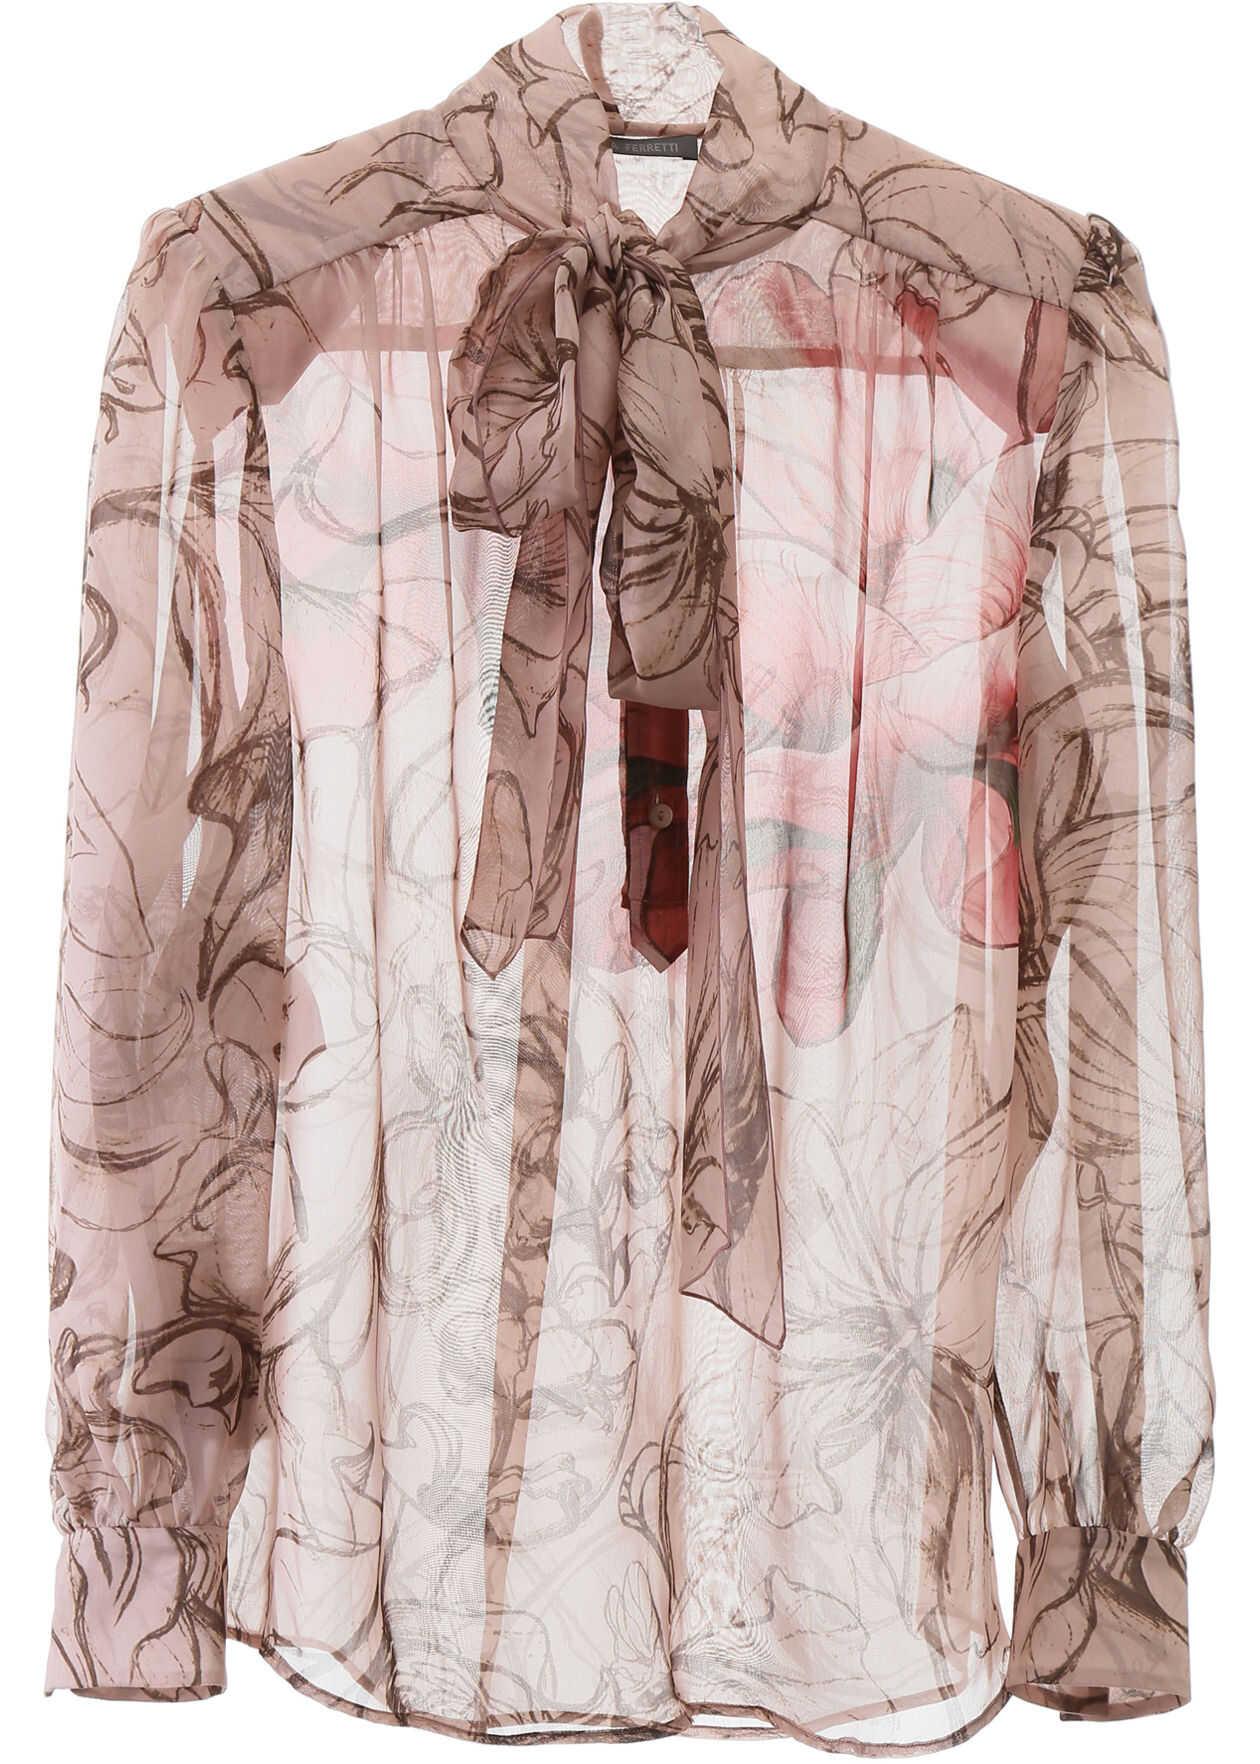 Alberta Ferretti Floral Silk Shirt FANTASY PRINT PINK